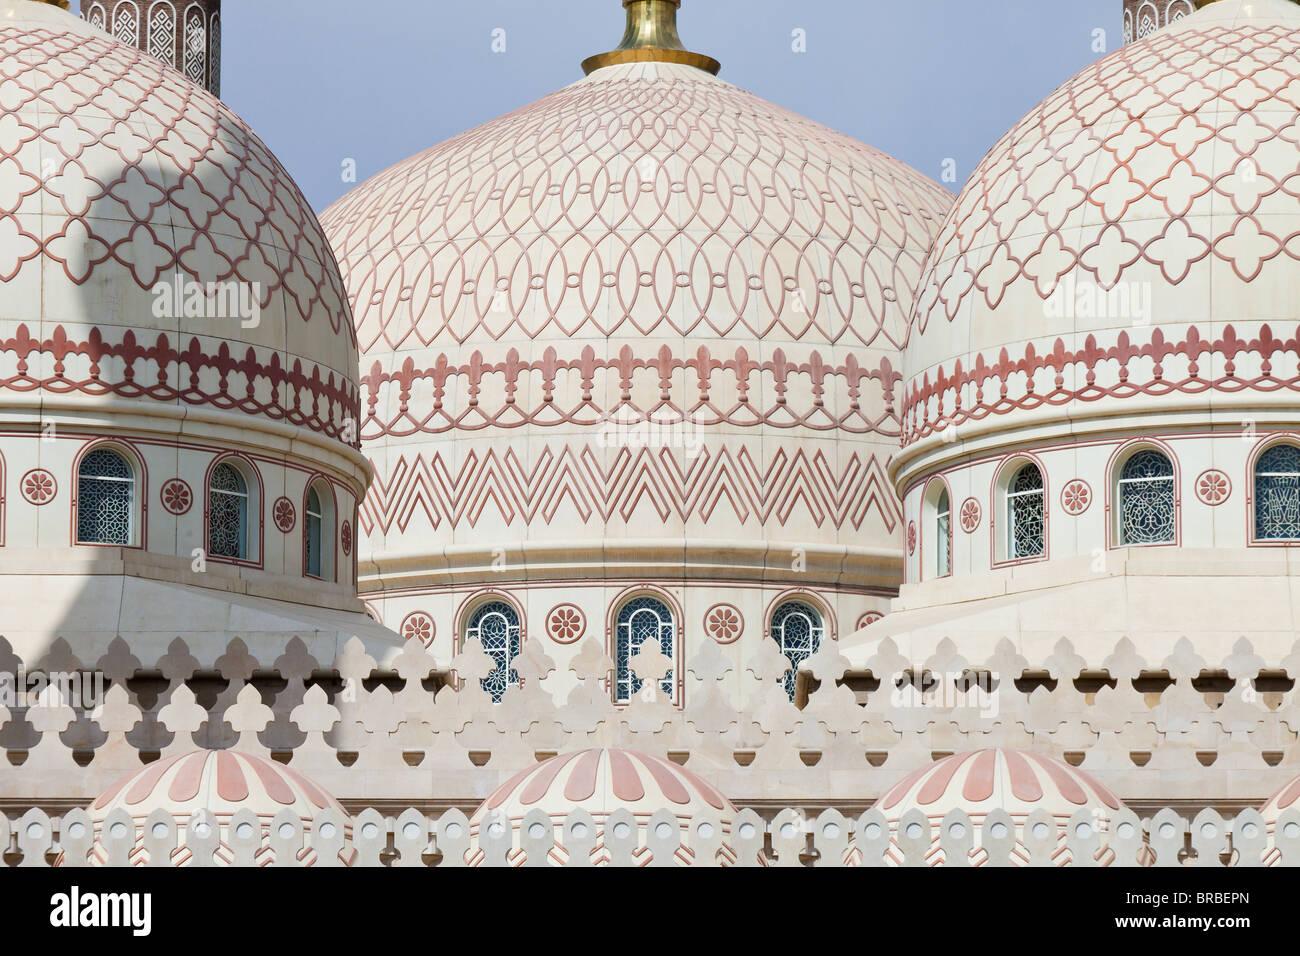 The Al-Saleh (President's) Mosque, Sana'a, Yemen - Stock Image